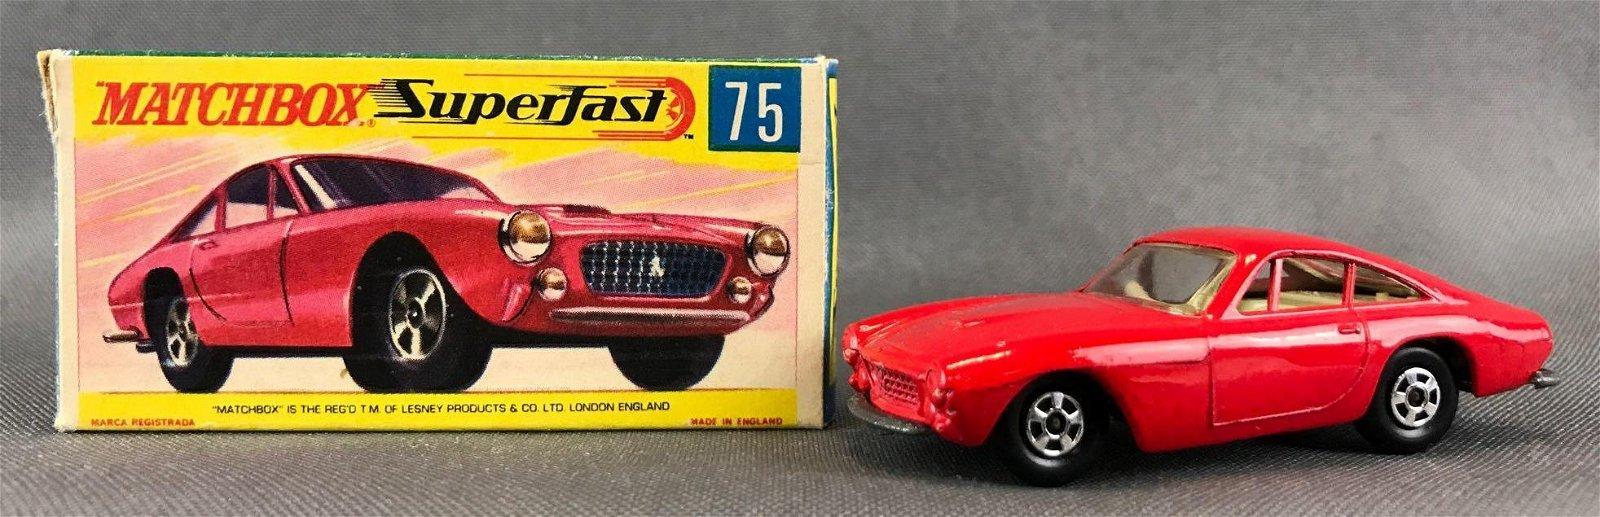 Matchbox Superfast No. 75 Ferrari Berlinetta Die-Cast